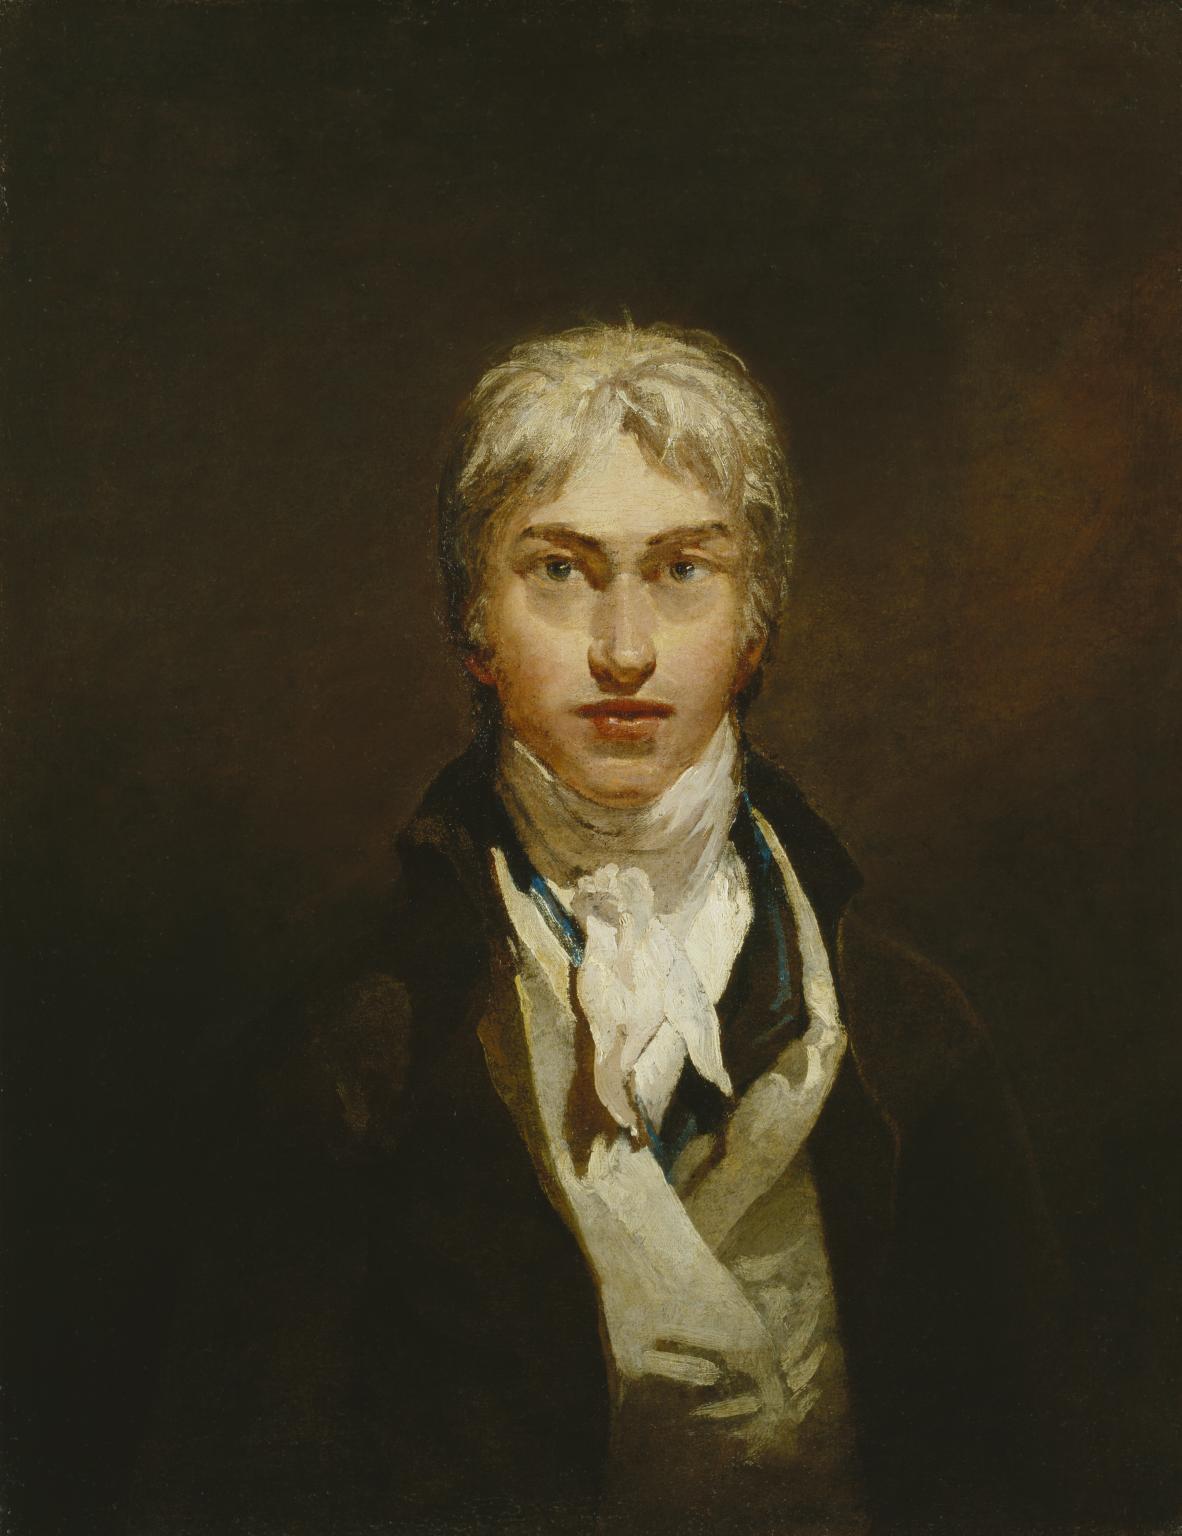 Joseph Mallord William Turner, Self-Portrait, c. 1799